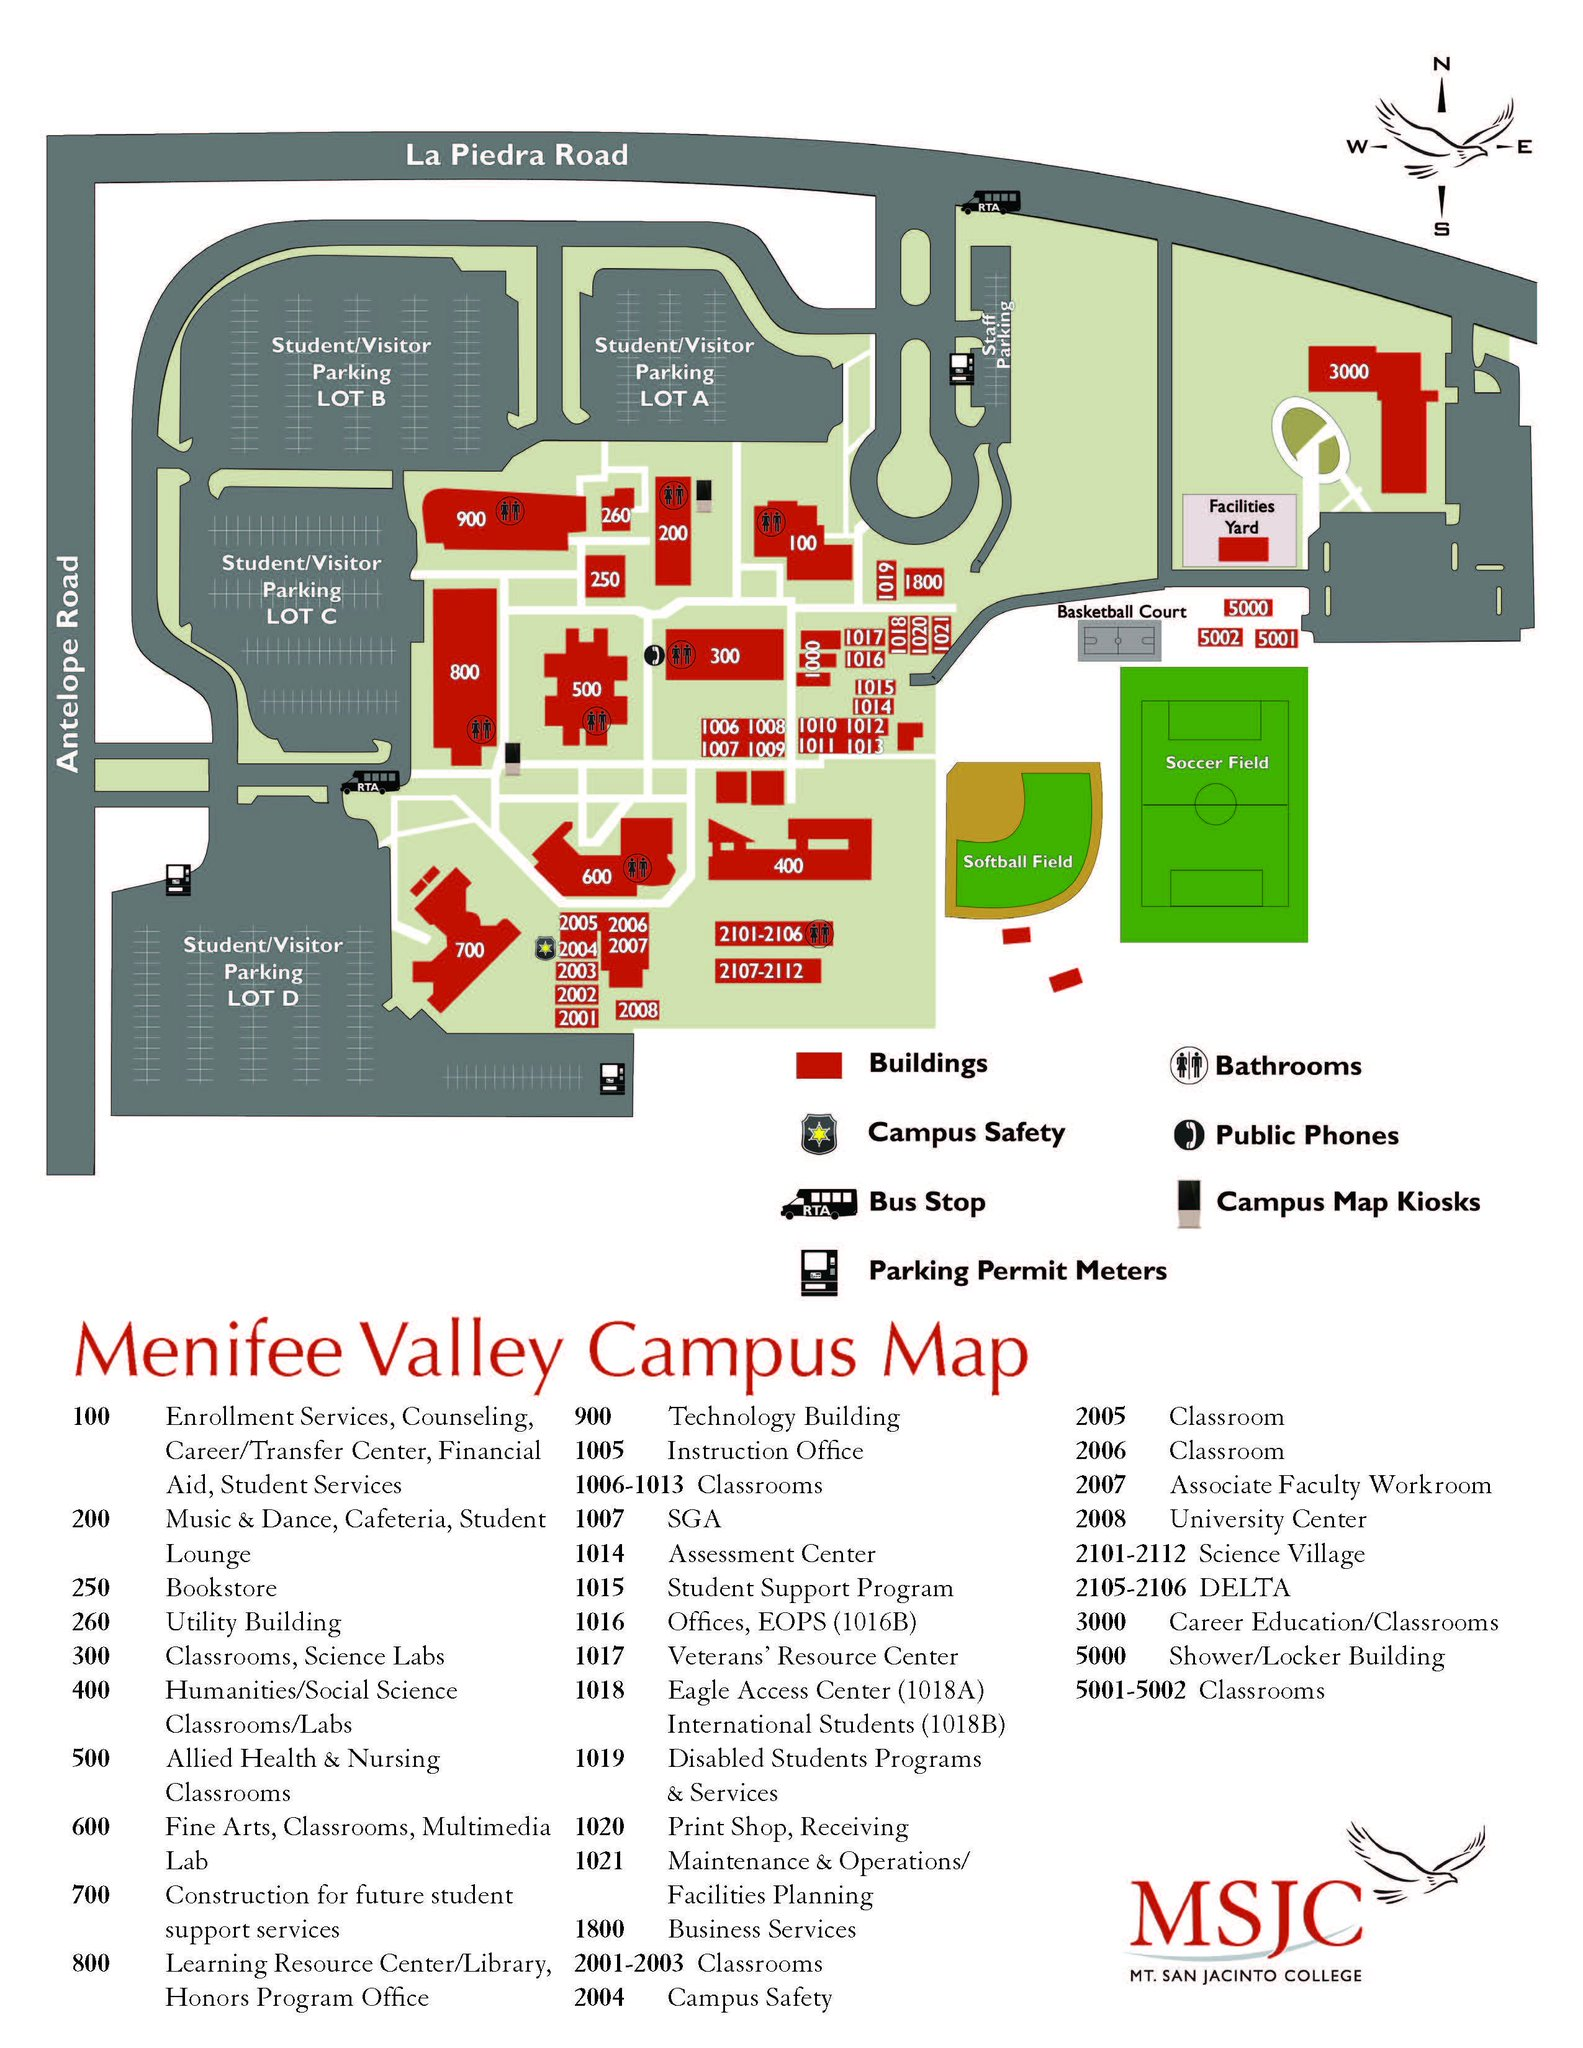 Msjc Menifee Campus Map MSJC on Twitter: